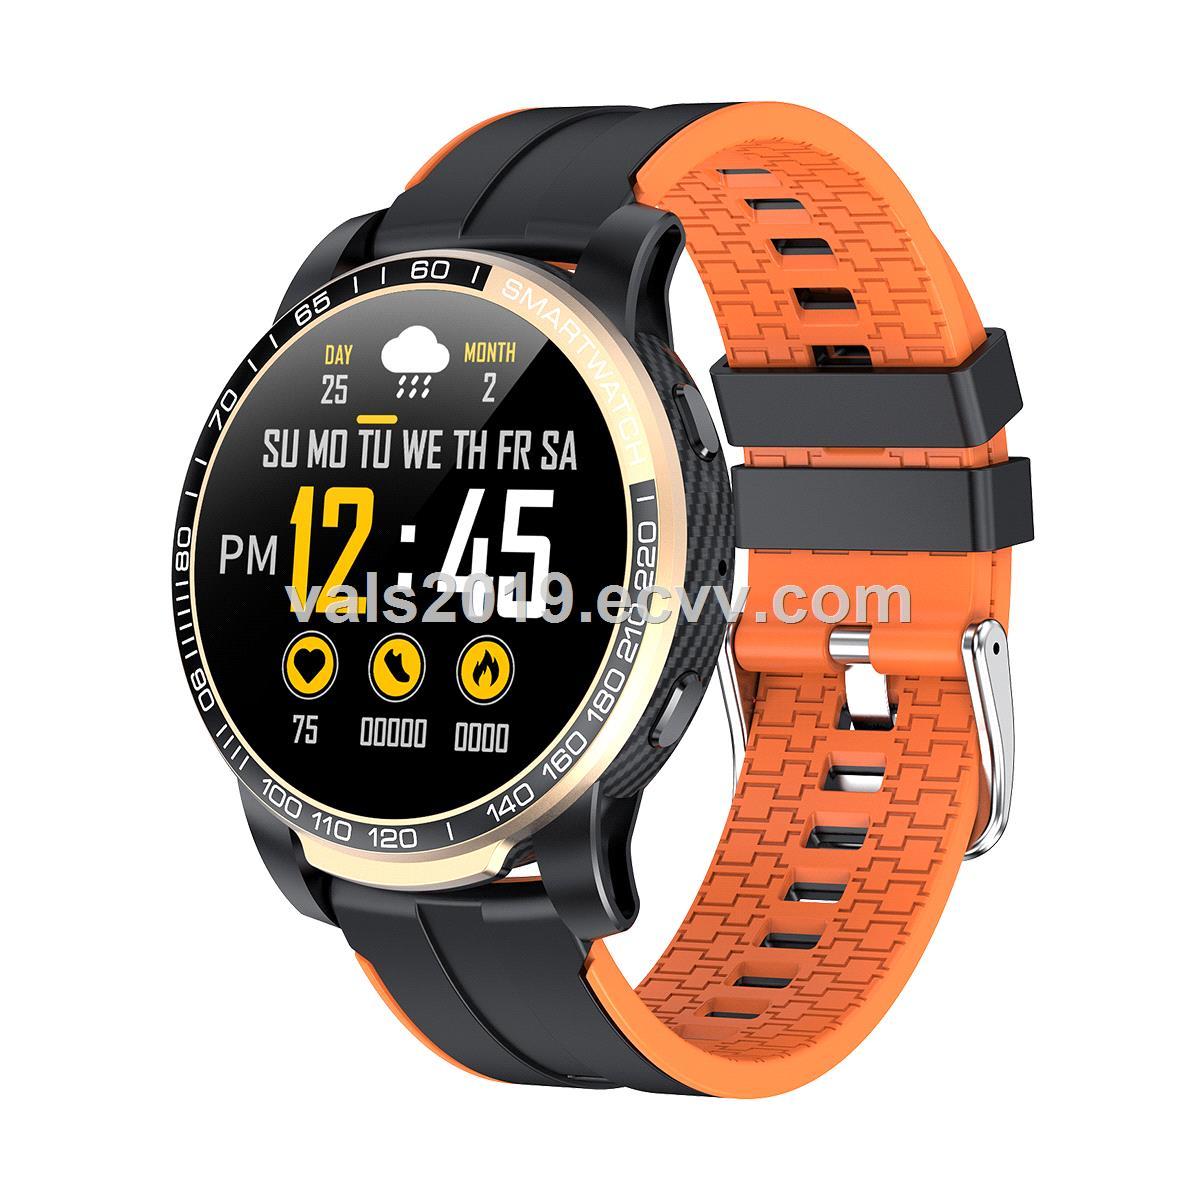 new smartwatchHeart rate ECGBlood pressureblood oxygenpedometerAlipayStop watchBluetooth smartwatch